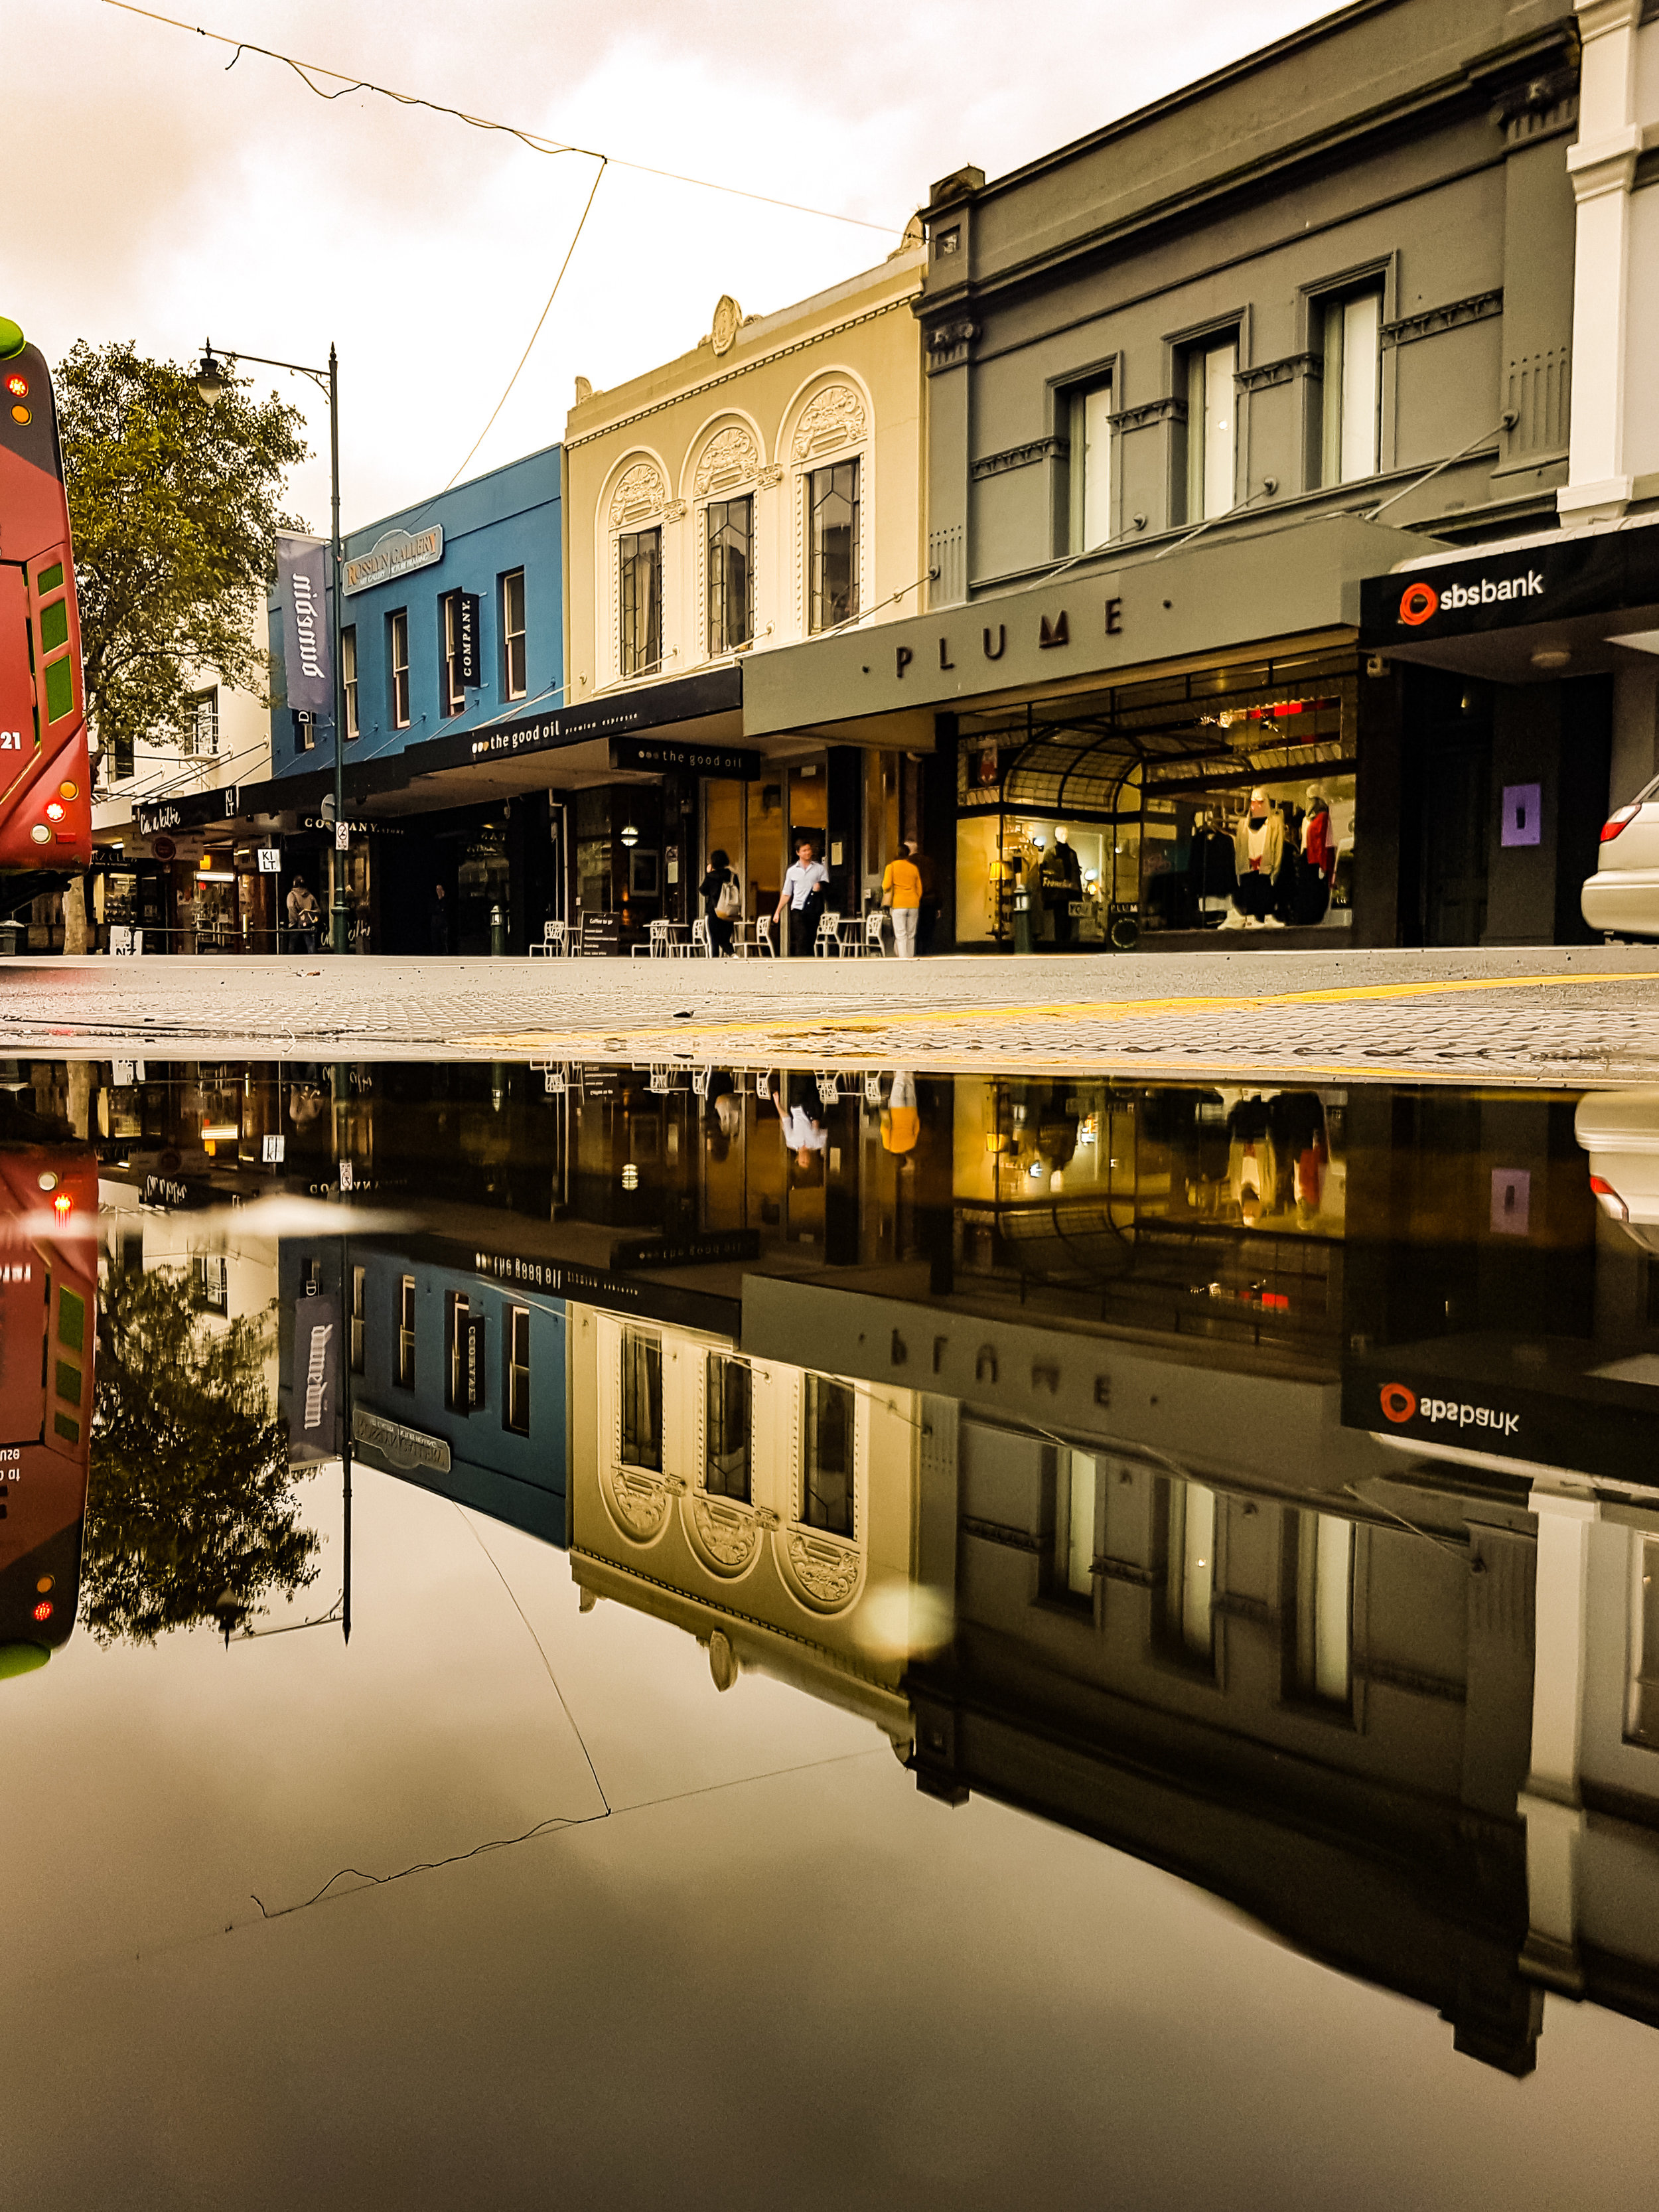 George Street Dunedin reflection of shops in water